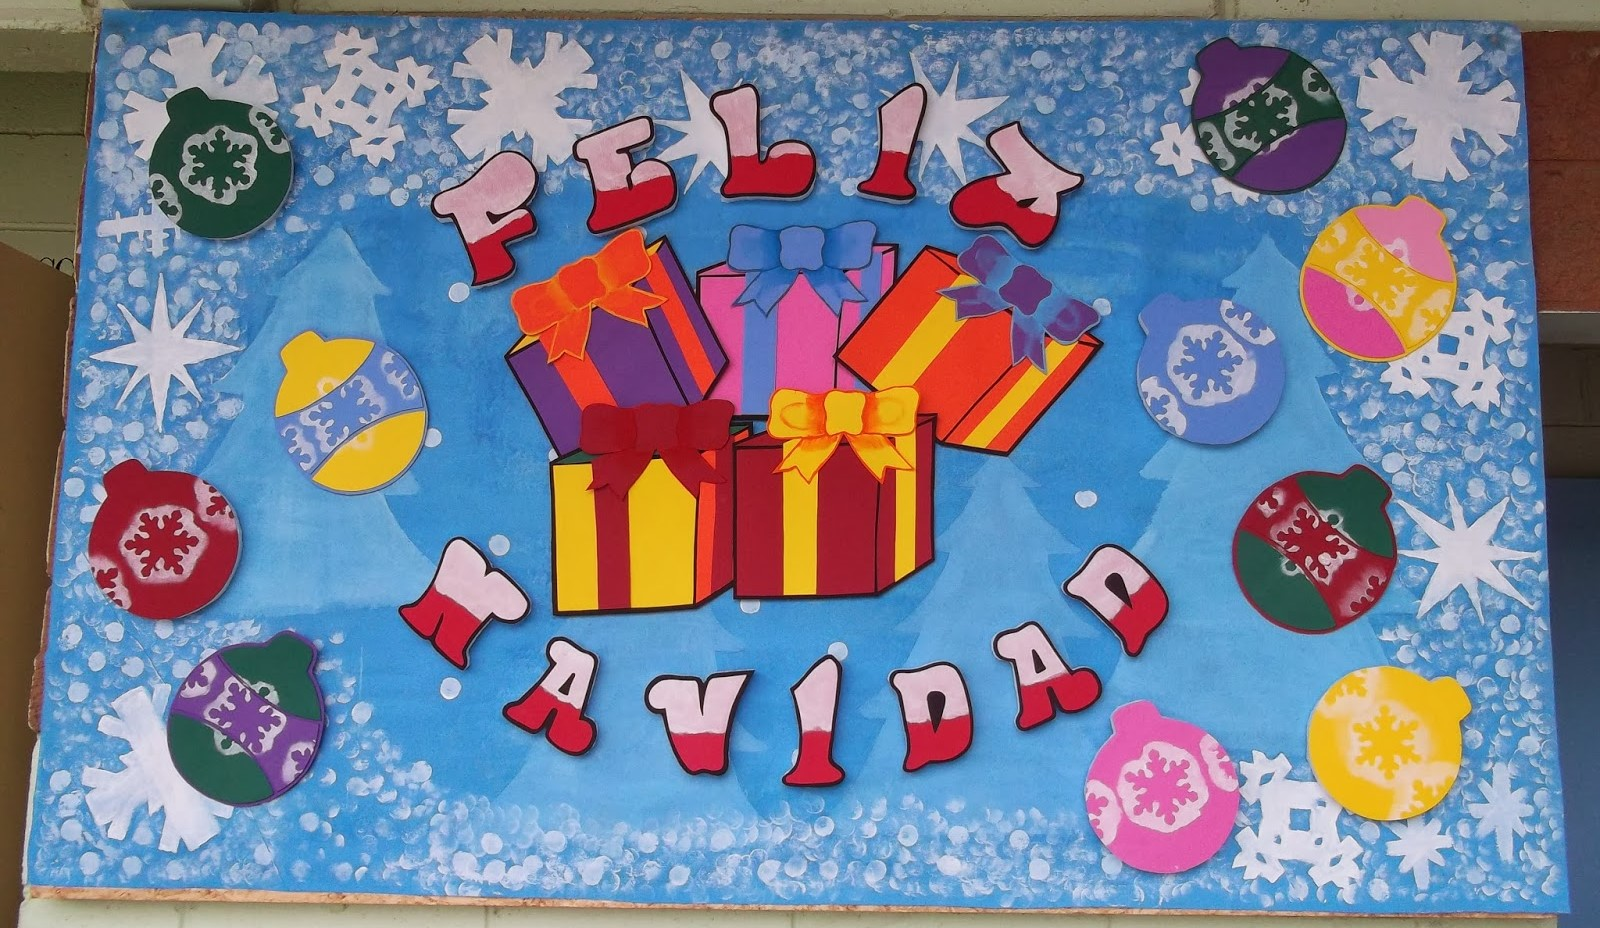 Periodico mural diciembre 5 imagenes educativas for Murales infantiles para preescolar